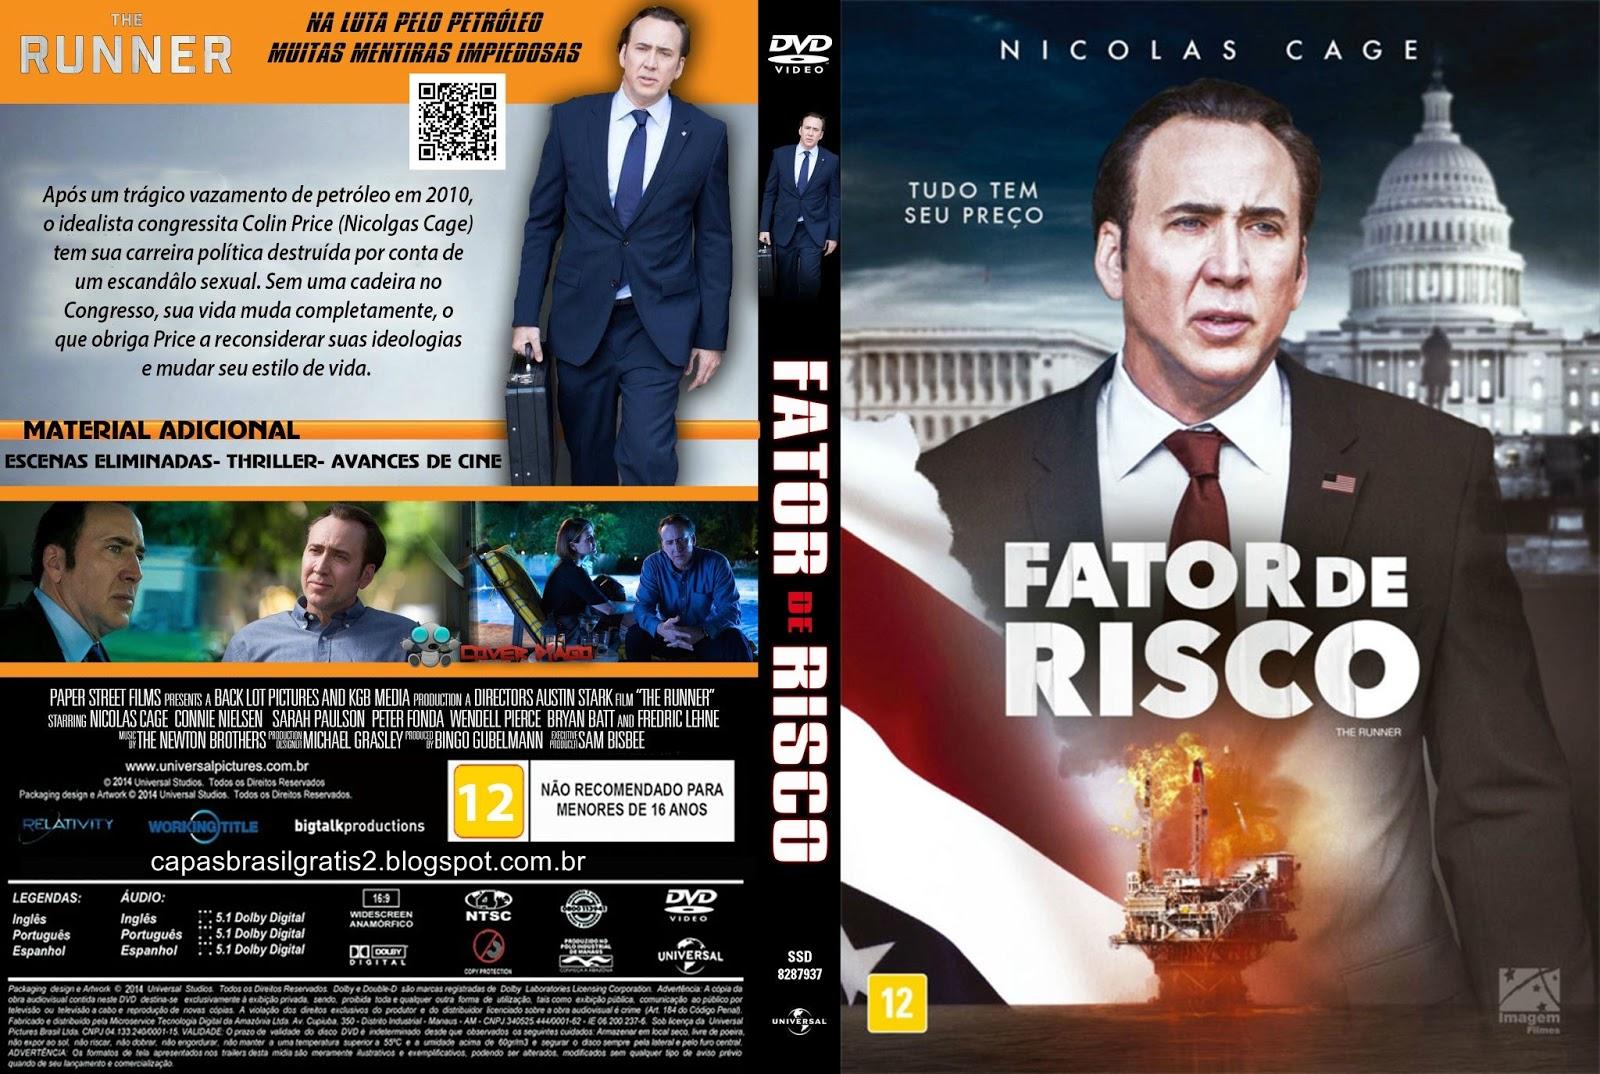 Download Fator de Risco BDRip XviD Dual Áudio Fator de Risco 01